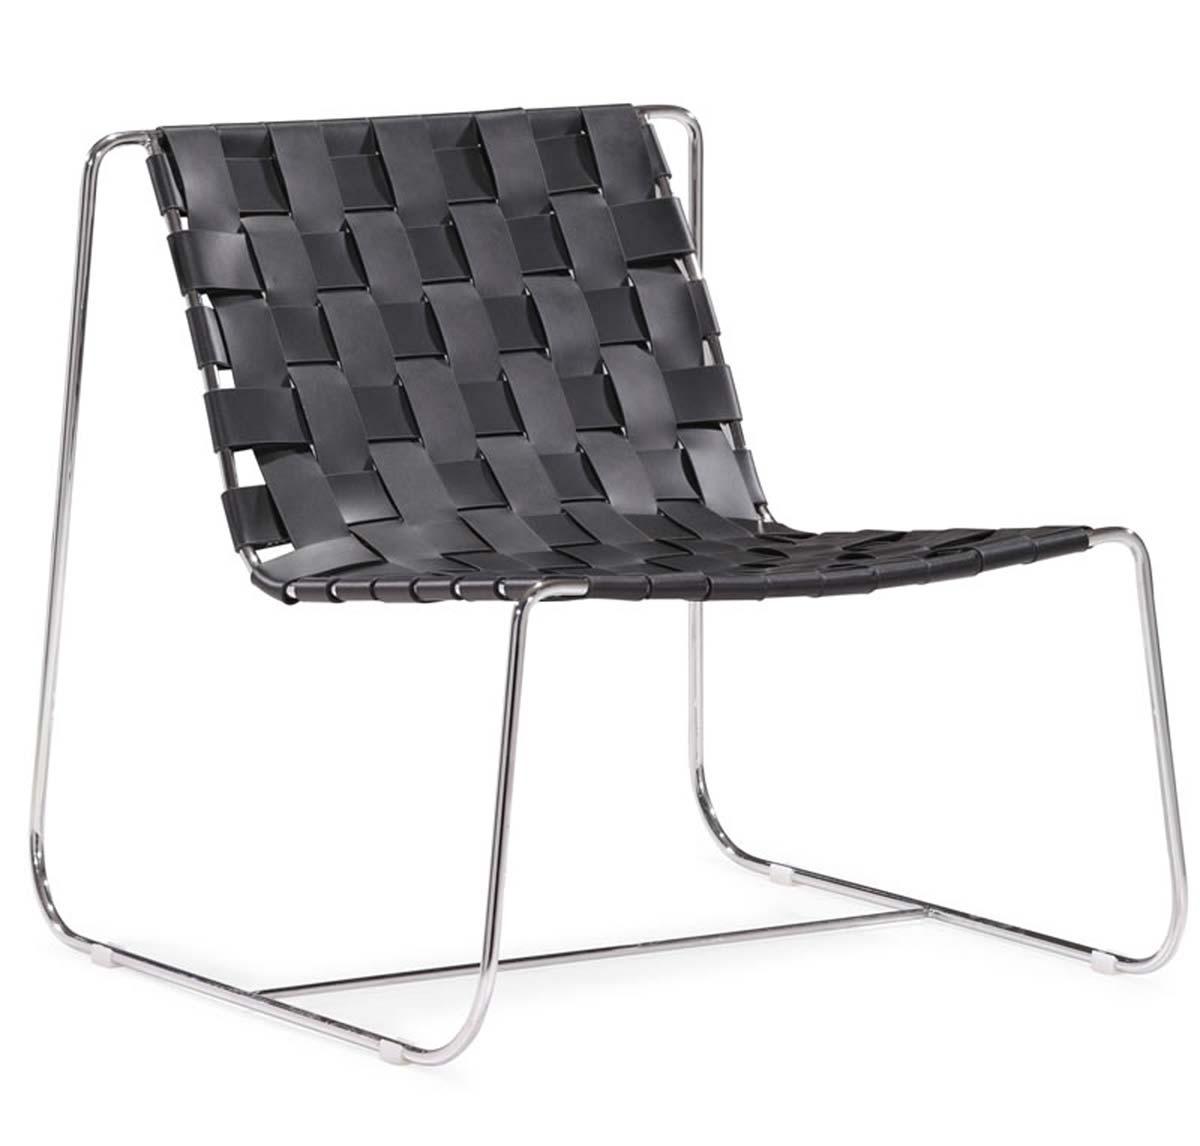 Zuo Modern Prospect Park Lounge Chair - Black